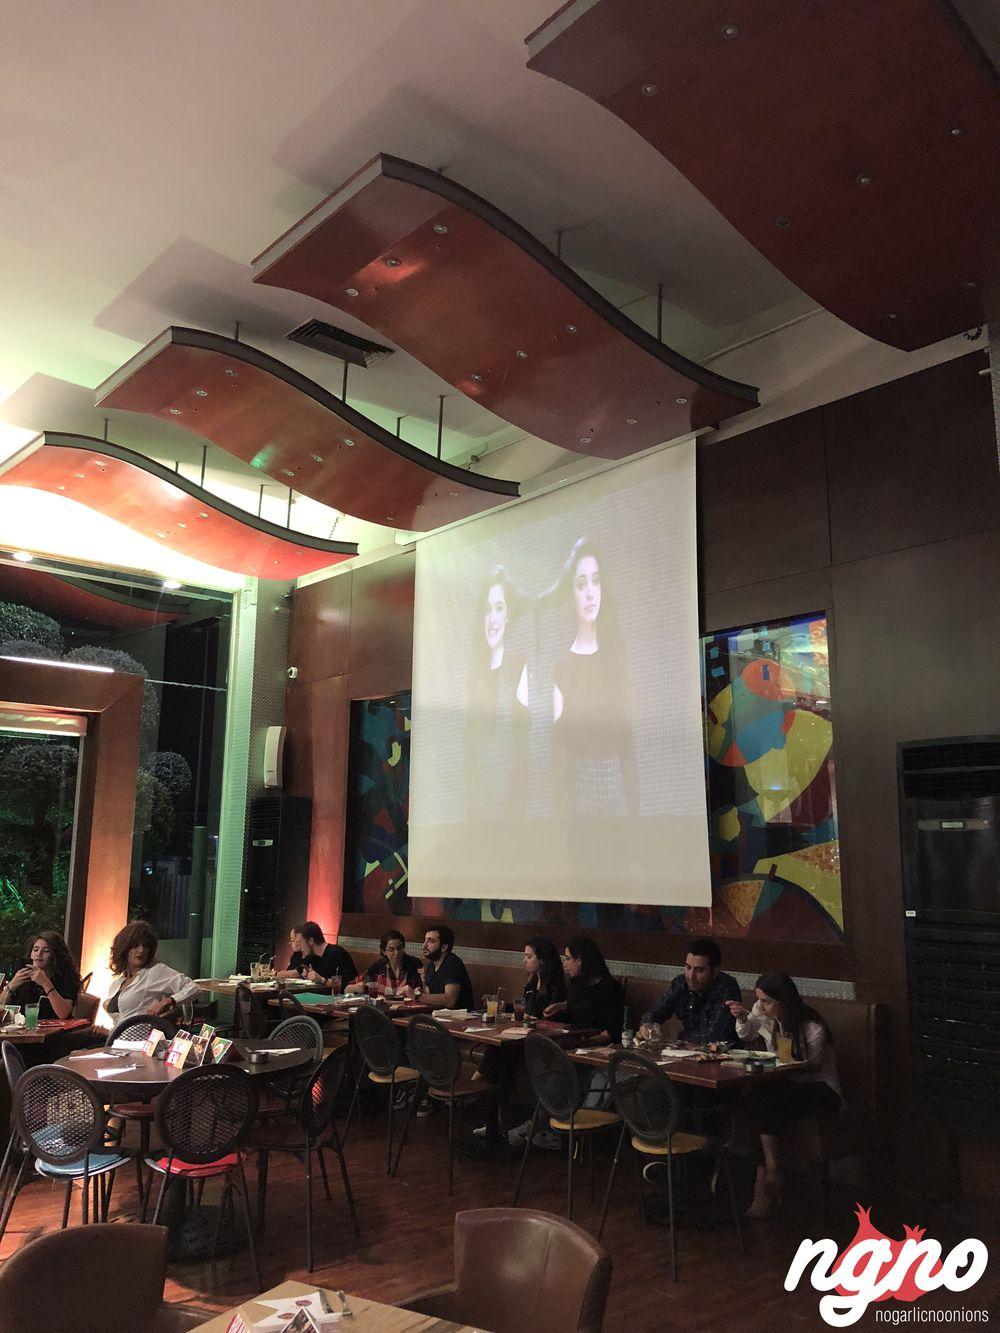 Restaurant Bruce Lee: description, interior, menu and reviews of visitors 89